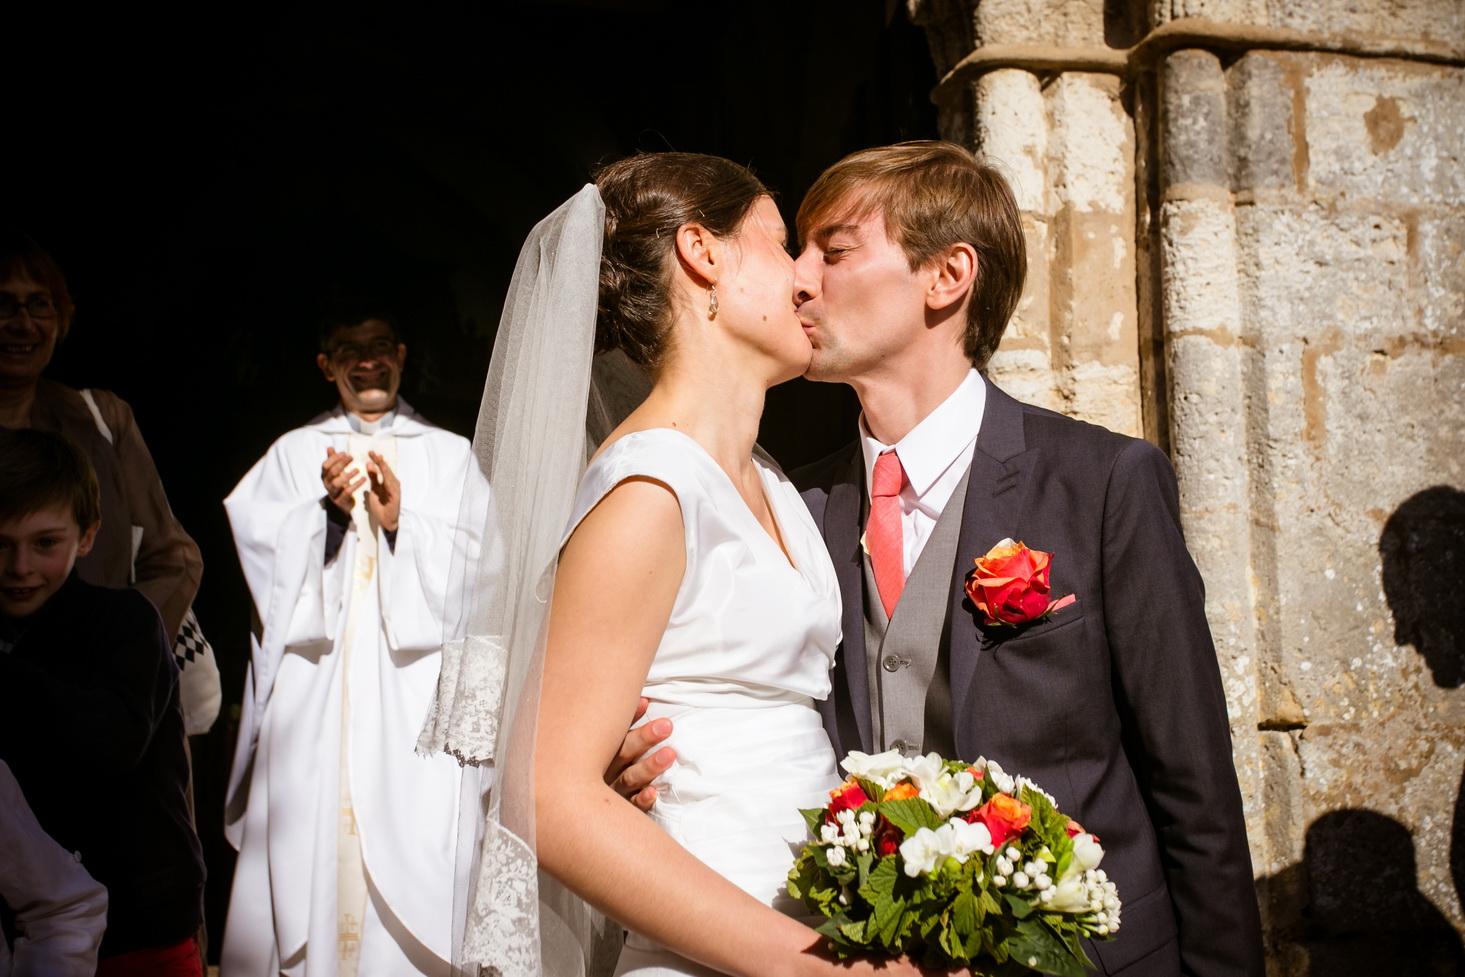 sortie d'église - mariage - wedding planner